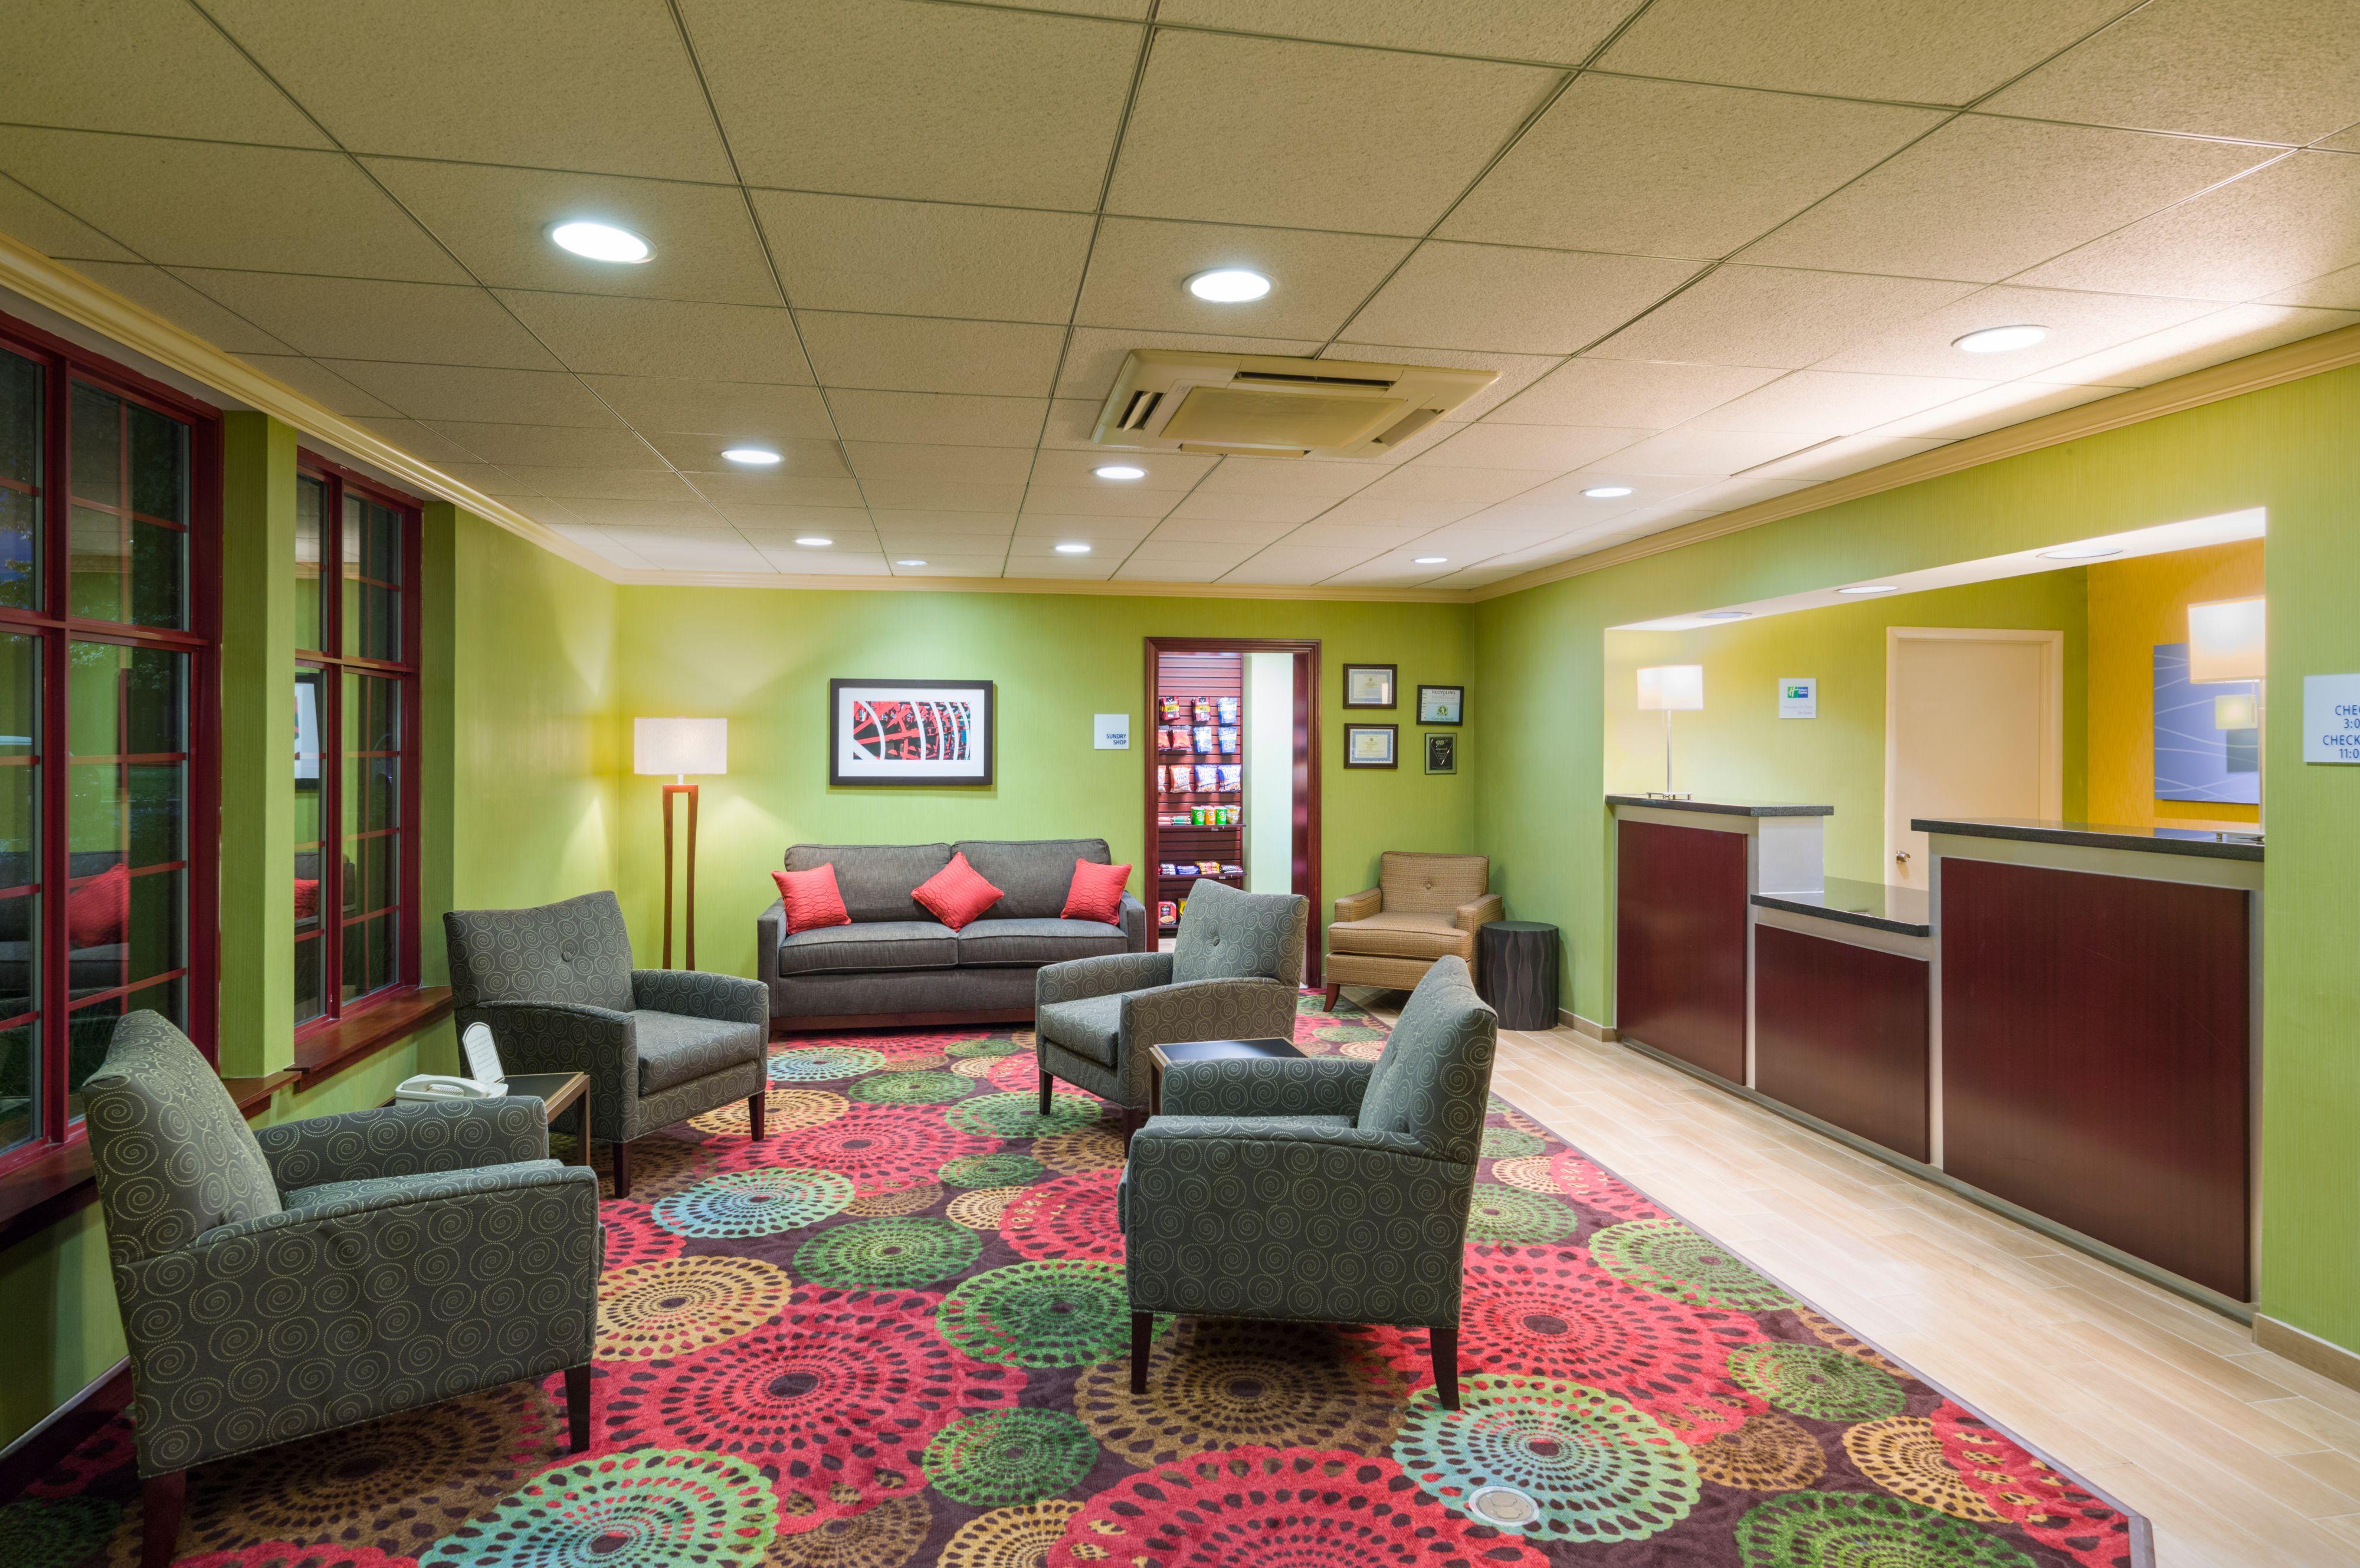 Holiday Inn Express Frazer-Malvern image 4